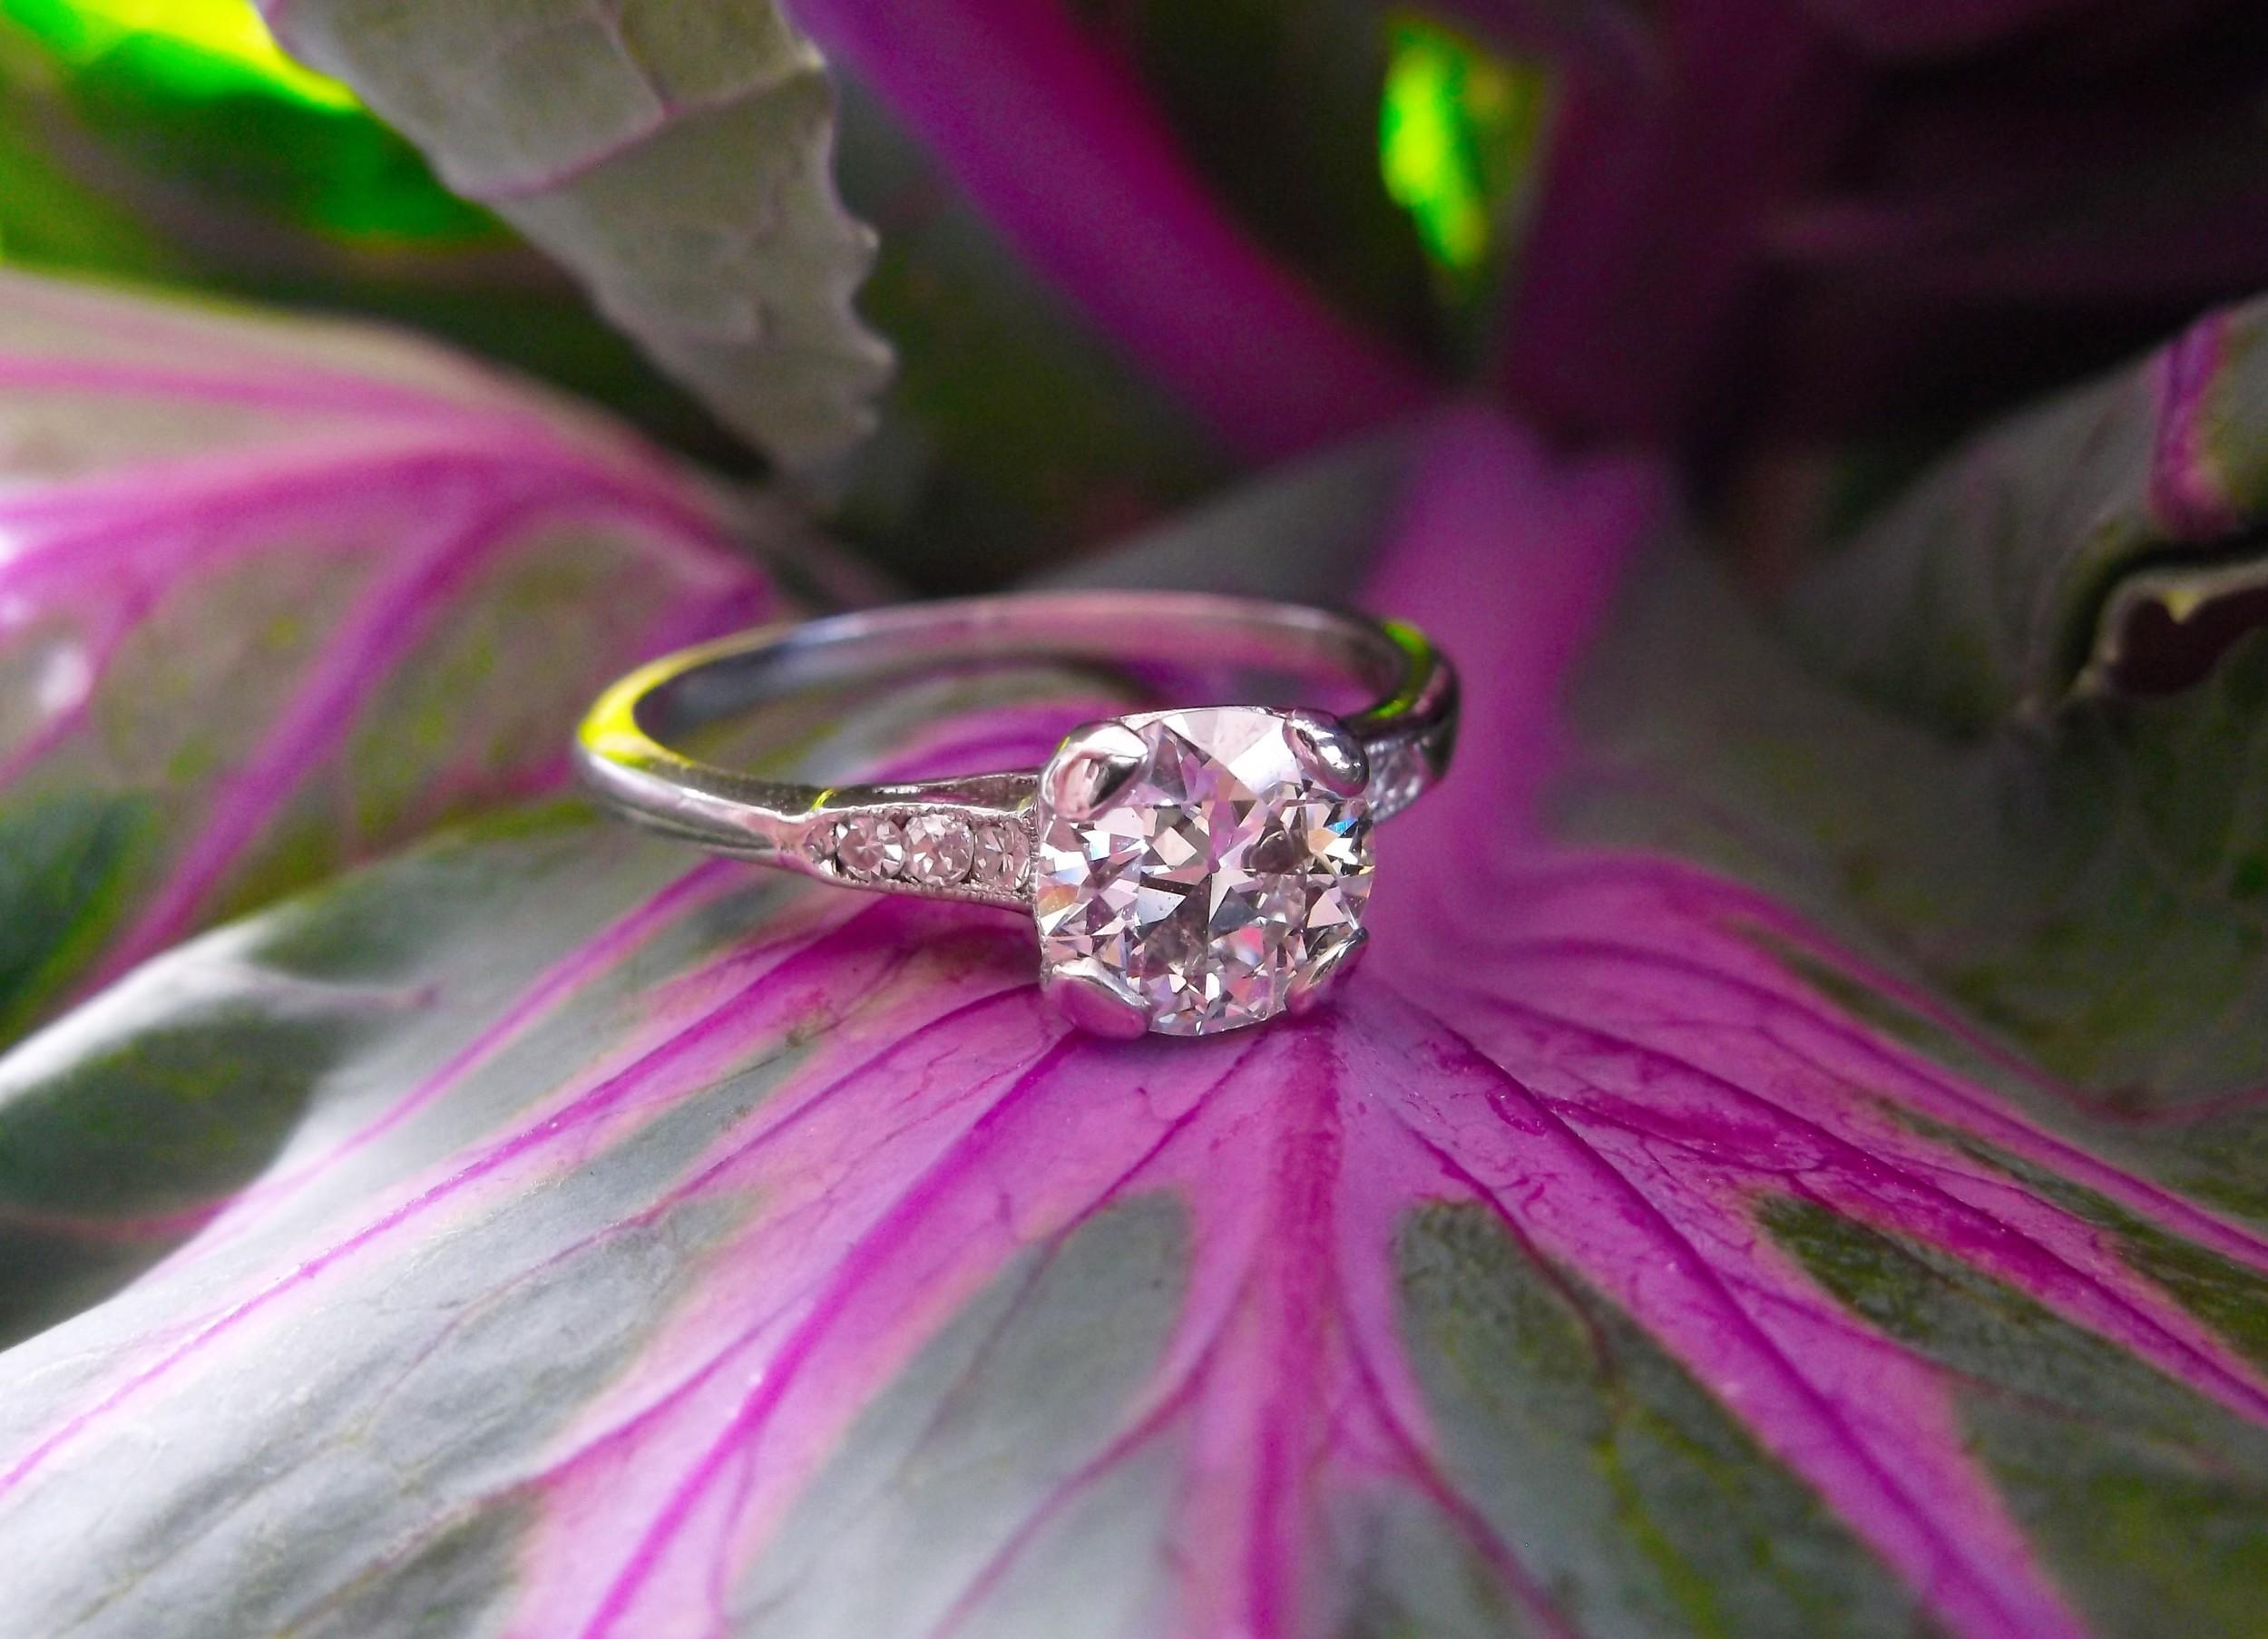 SOLD - Classy 1.00 carat Old European cut diamond in a beautiful platinum and diamond mounting.